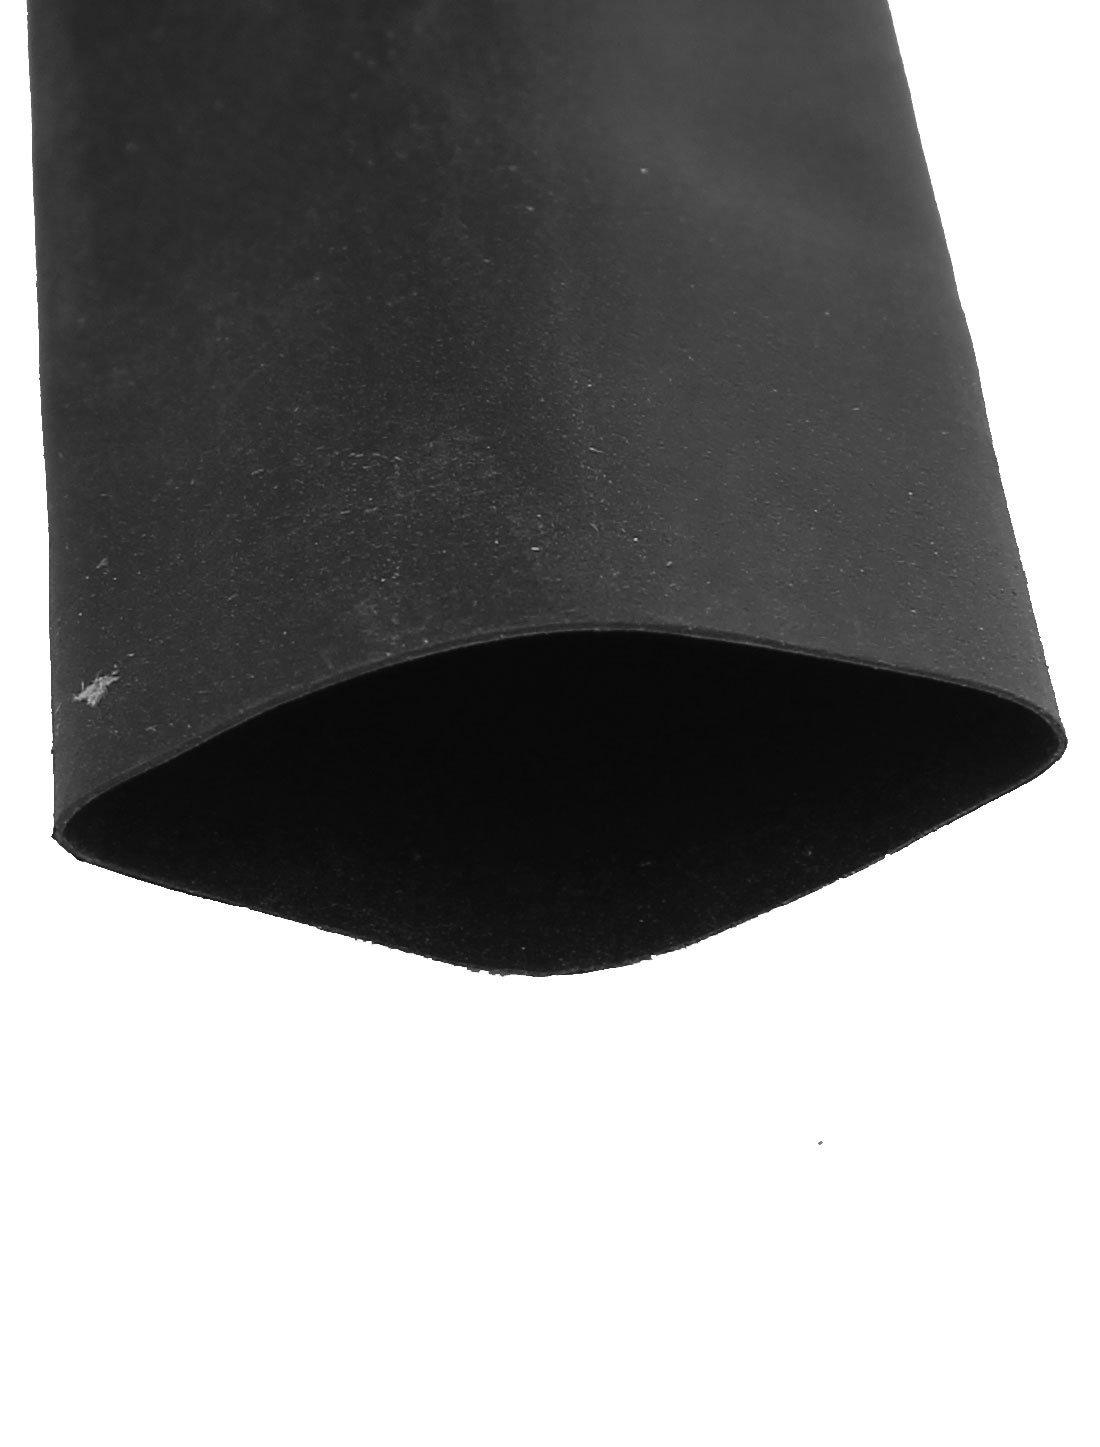 Amazon.com: Polyolefin 20 milímetros Tubo Diâmetro Heat Shrink Tubing 8.2Ft Preto Comprimento: Car Electronics